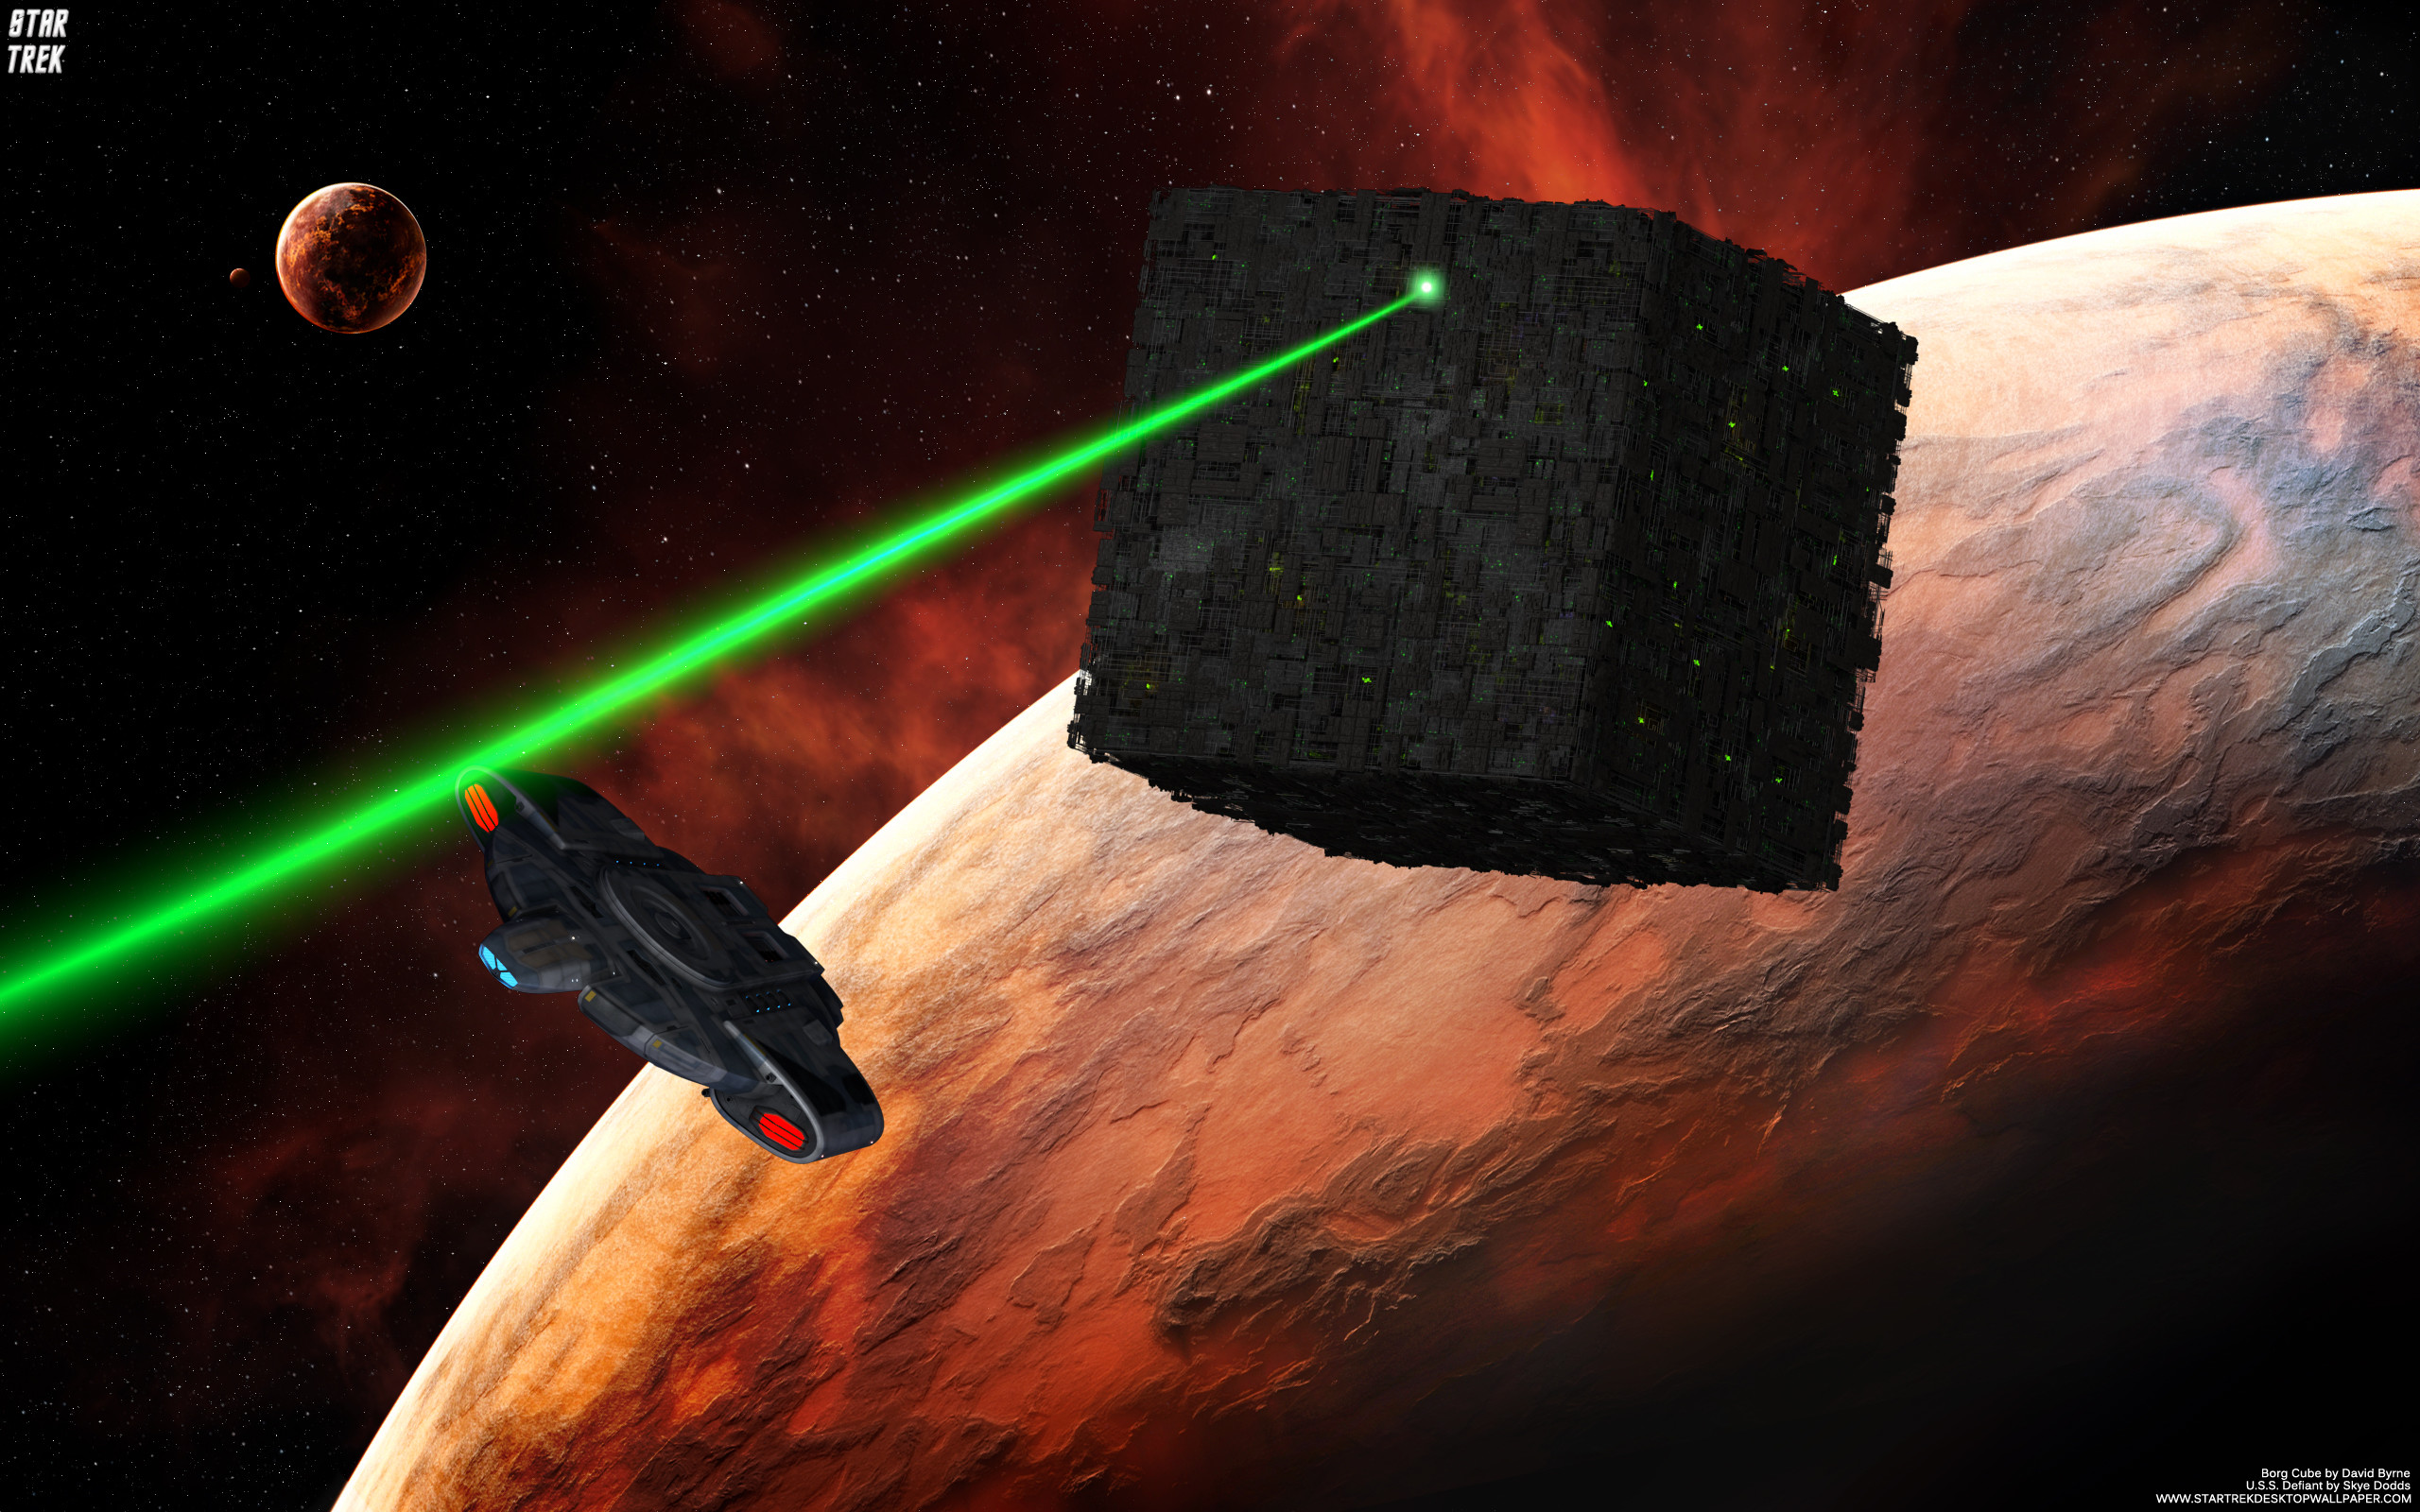 Star Trek Borg HD Wallpaper | Wallpapers | Pinterest | Star trek borg and  Hd wallpaper